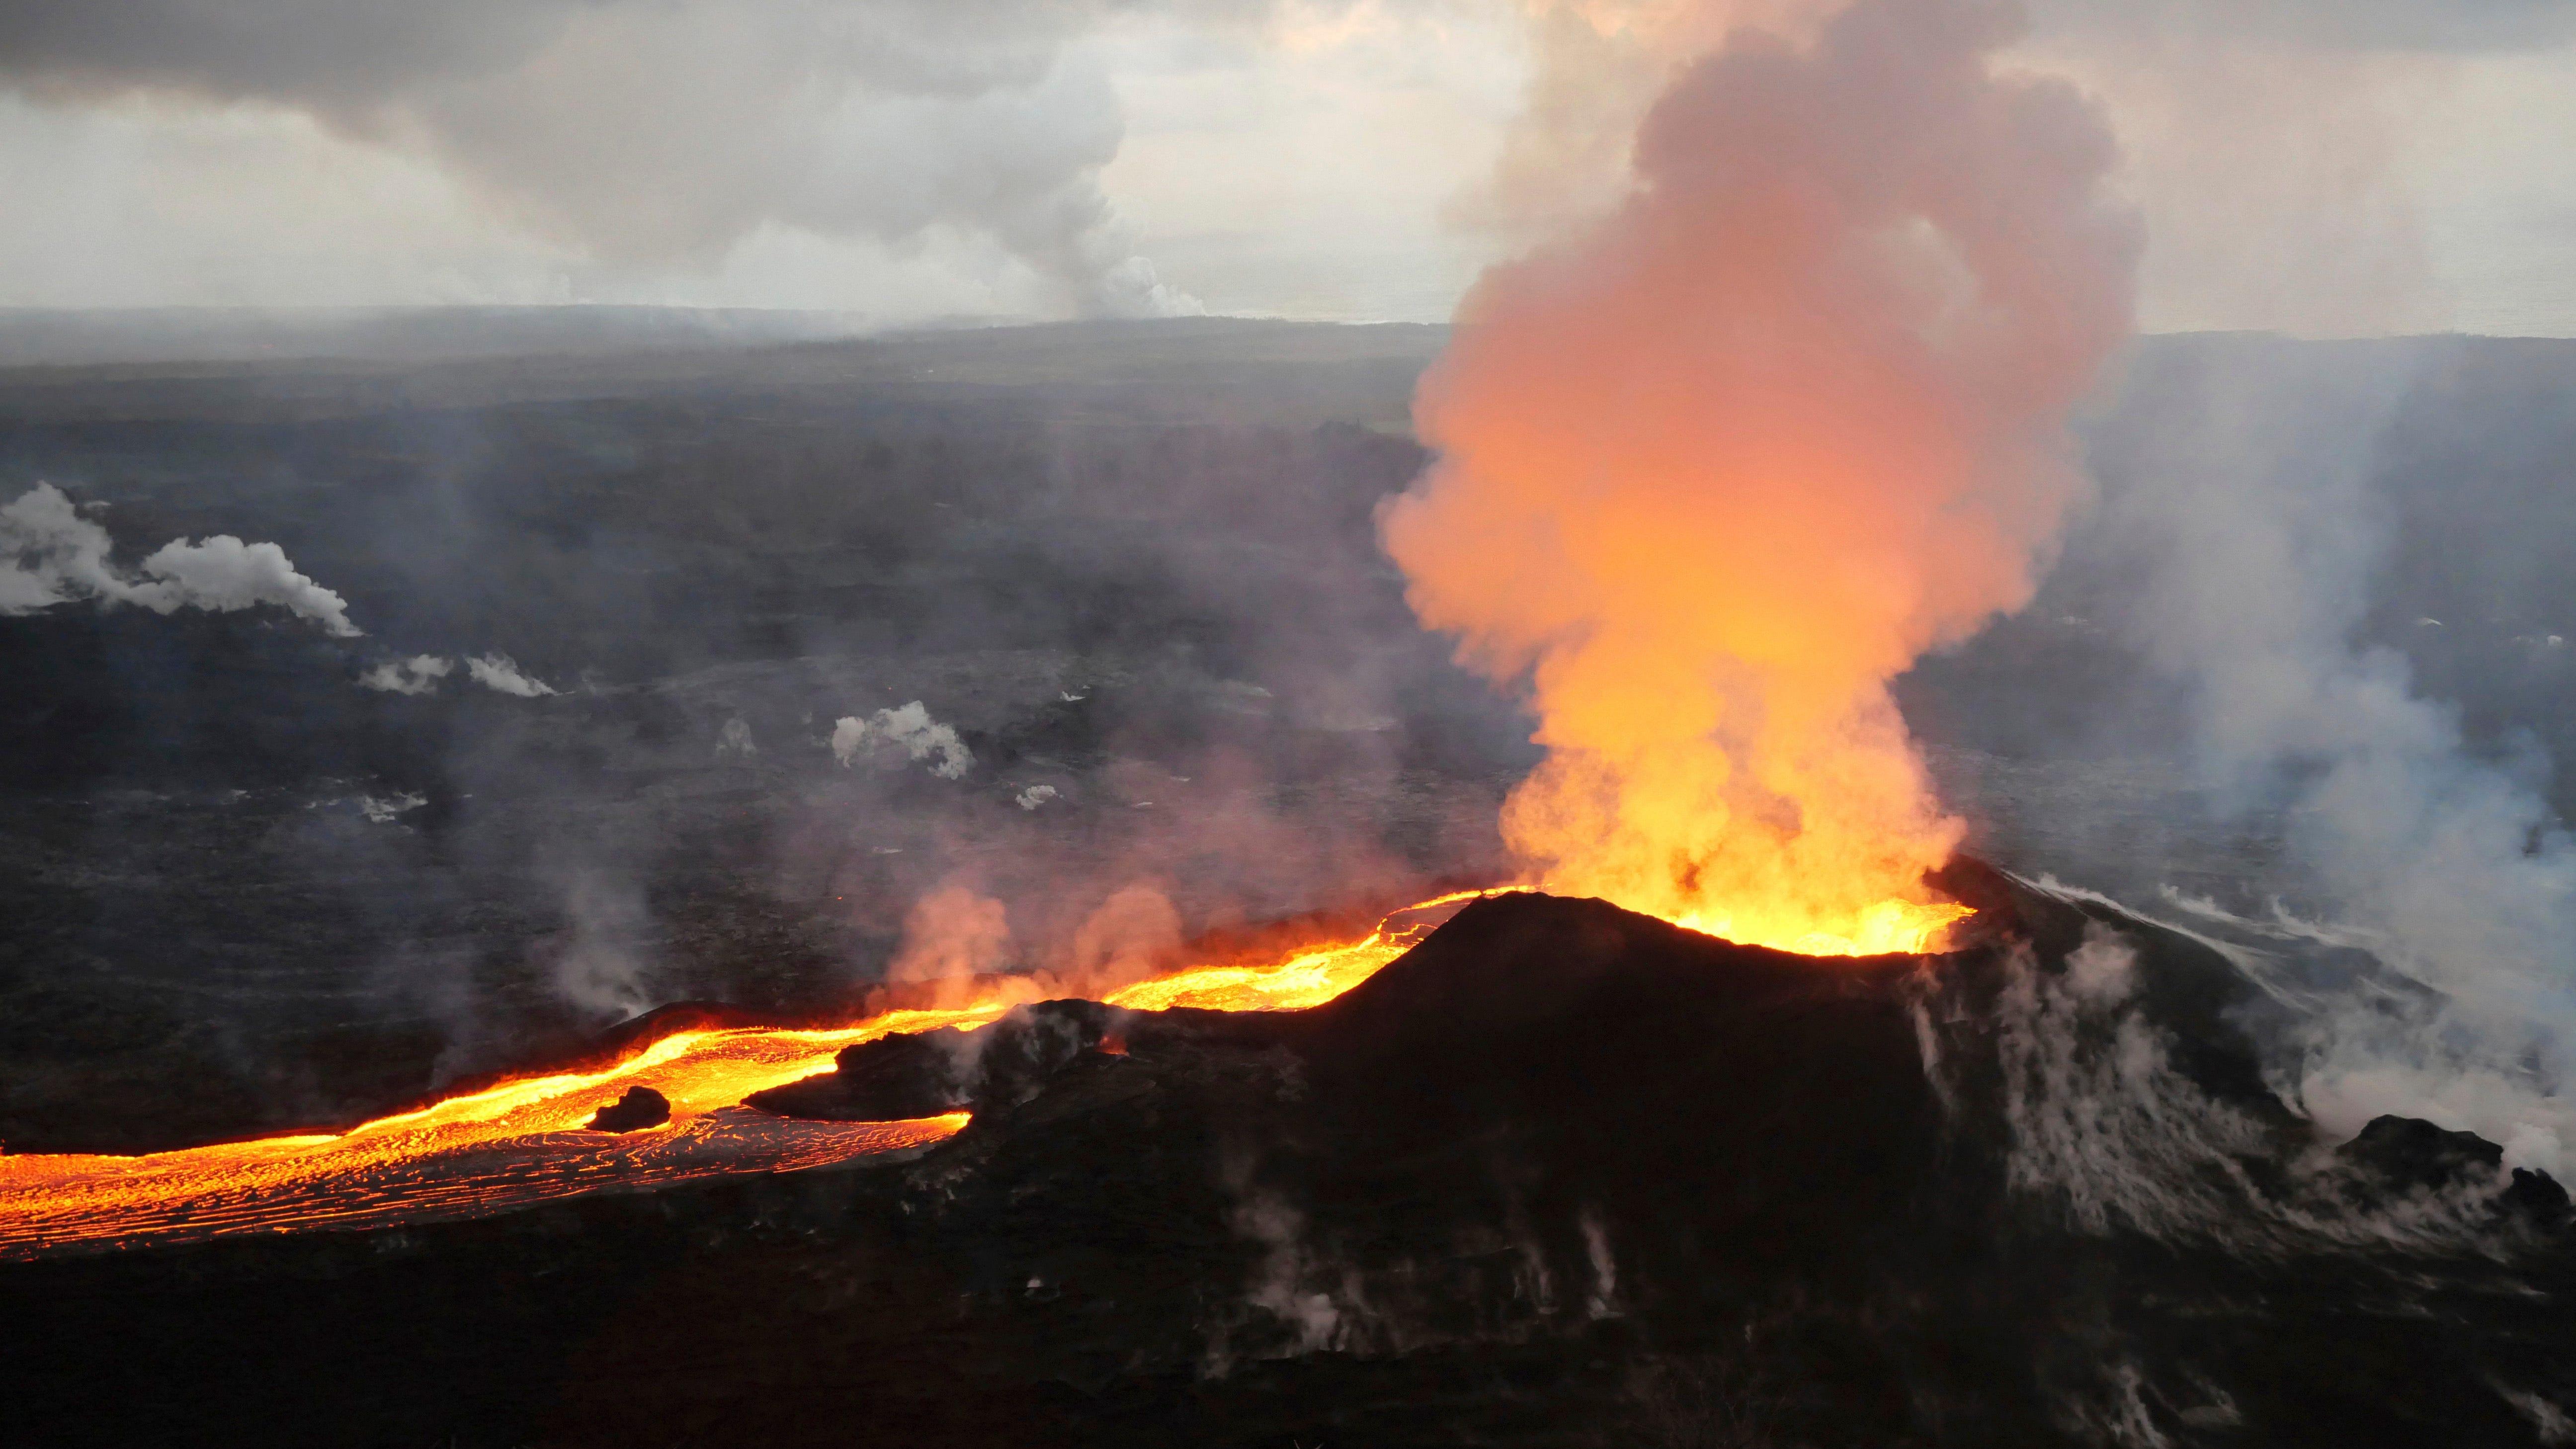 Volcanoes: 18 US volcanoes a high threat, Kilauea most ...